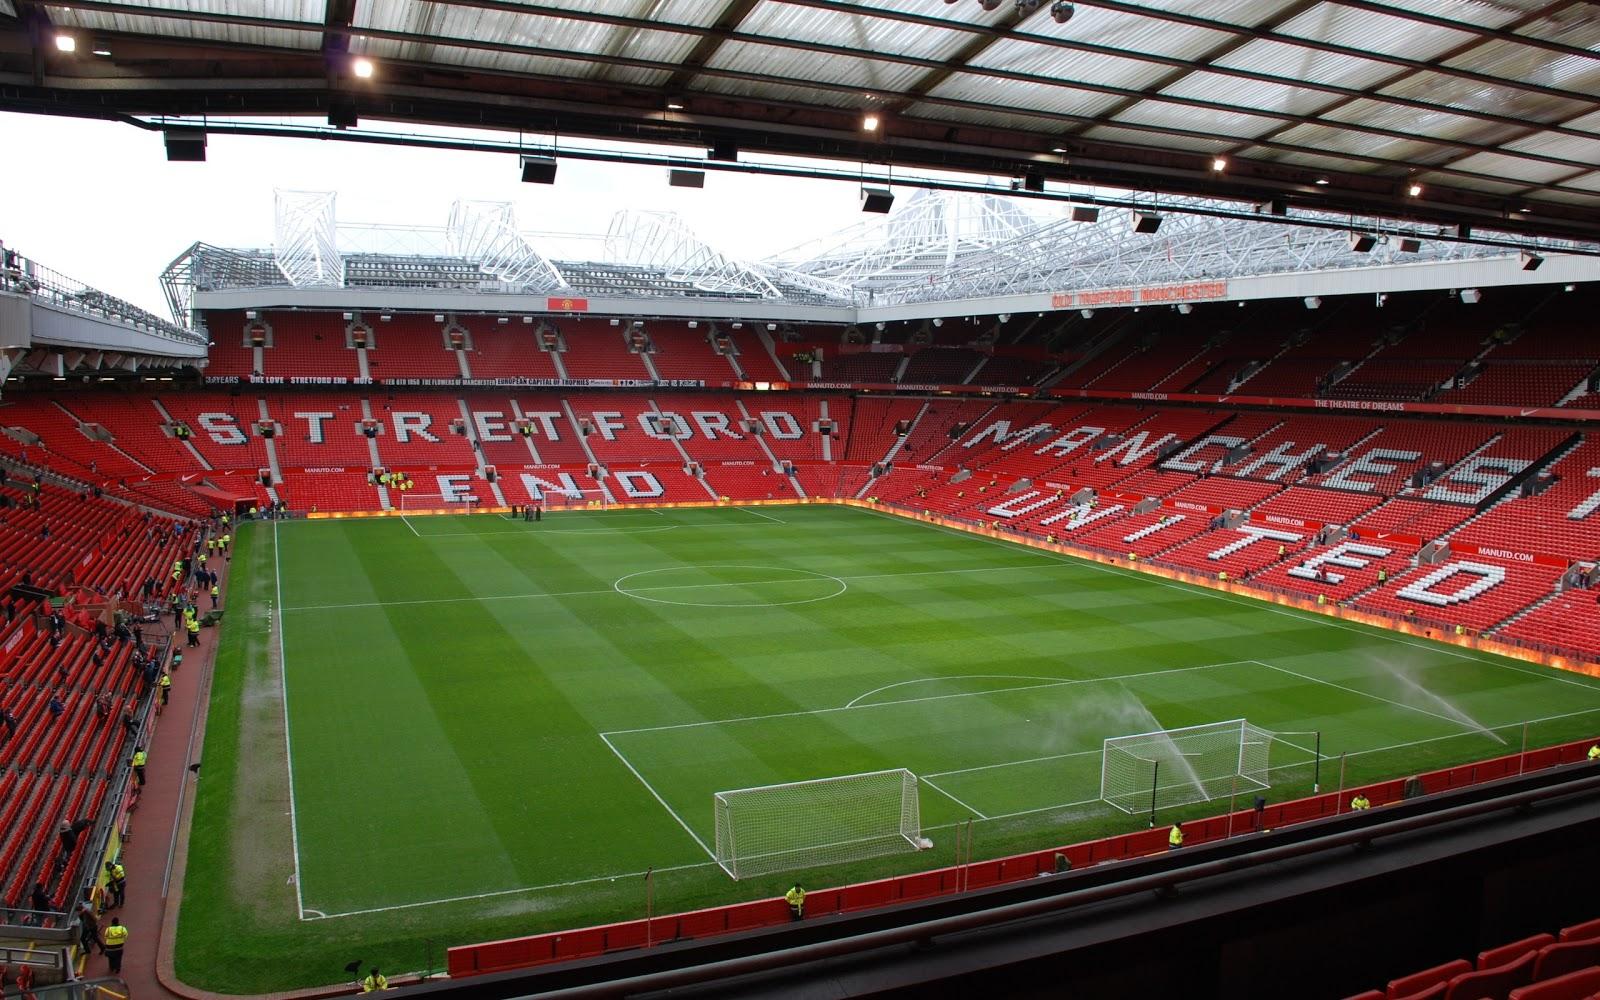 FOOTBALLERS CLUB [wallpaper] MANCHESTER UNITED TEAM STADIUM 1600x1000